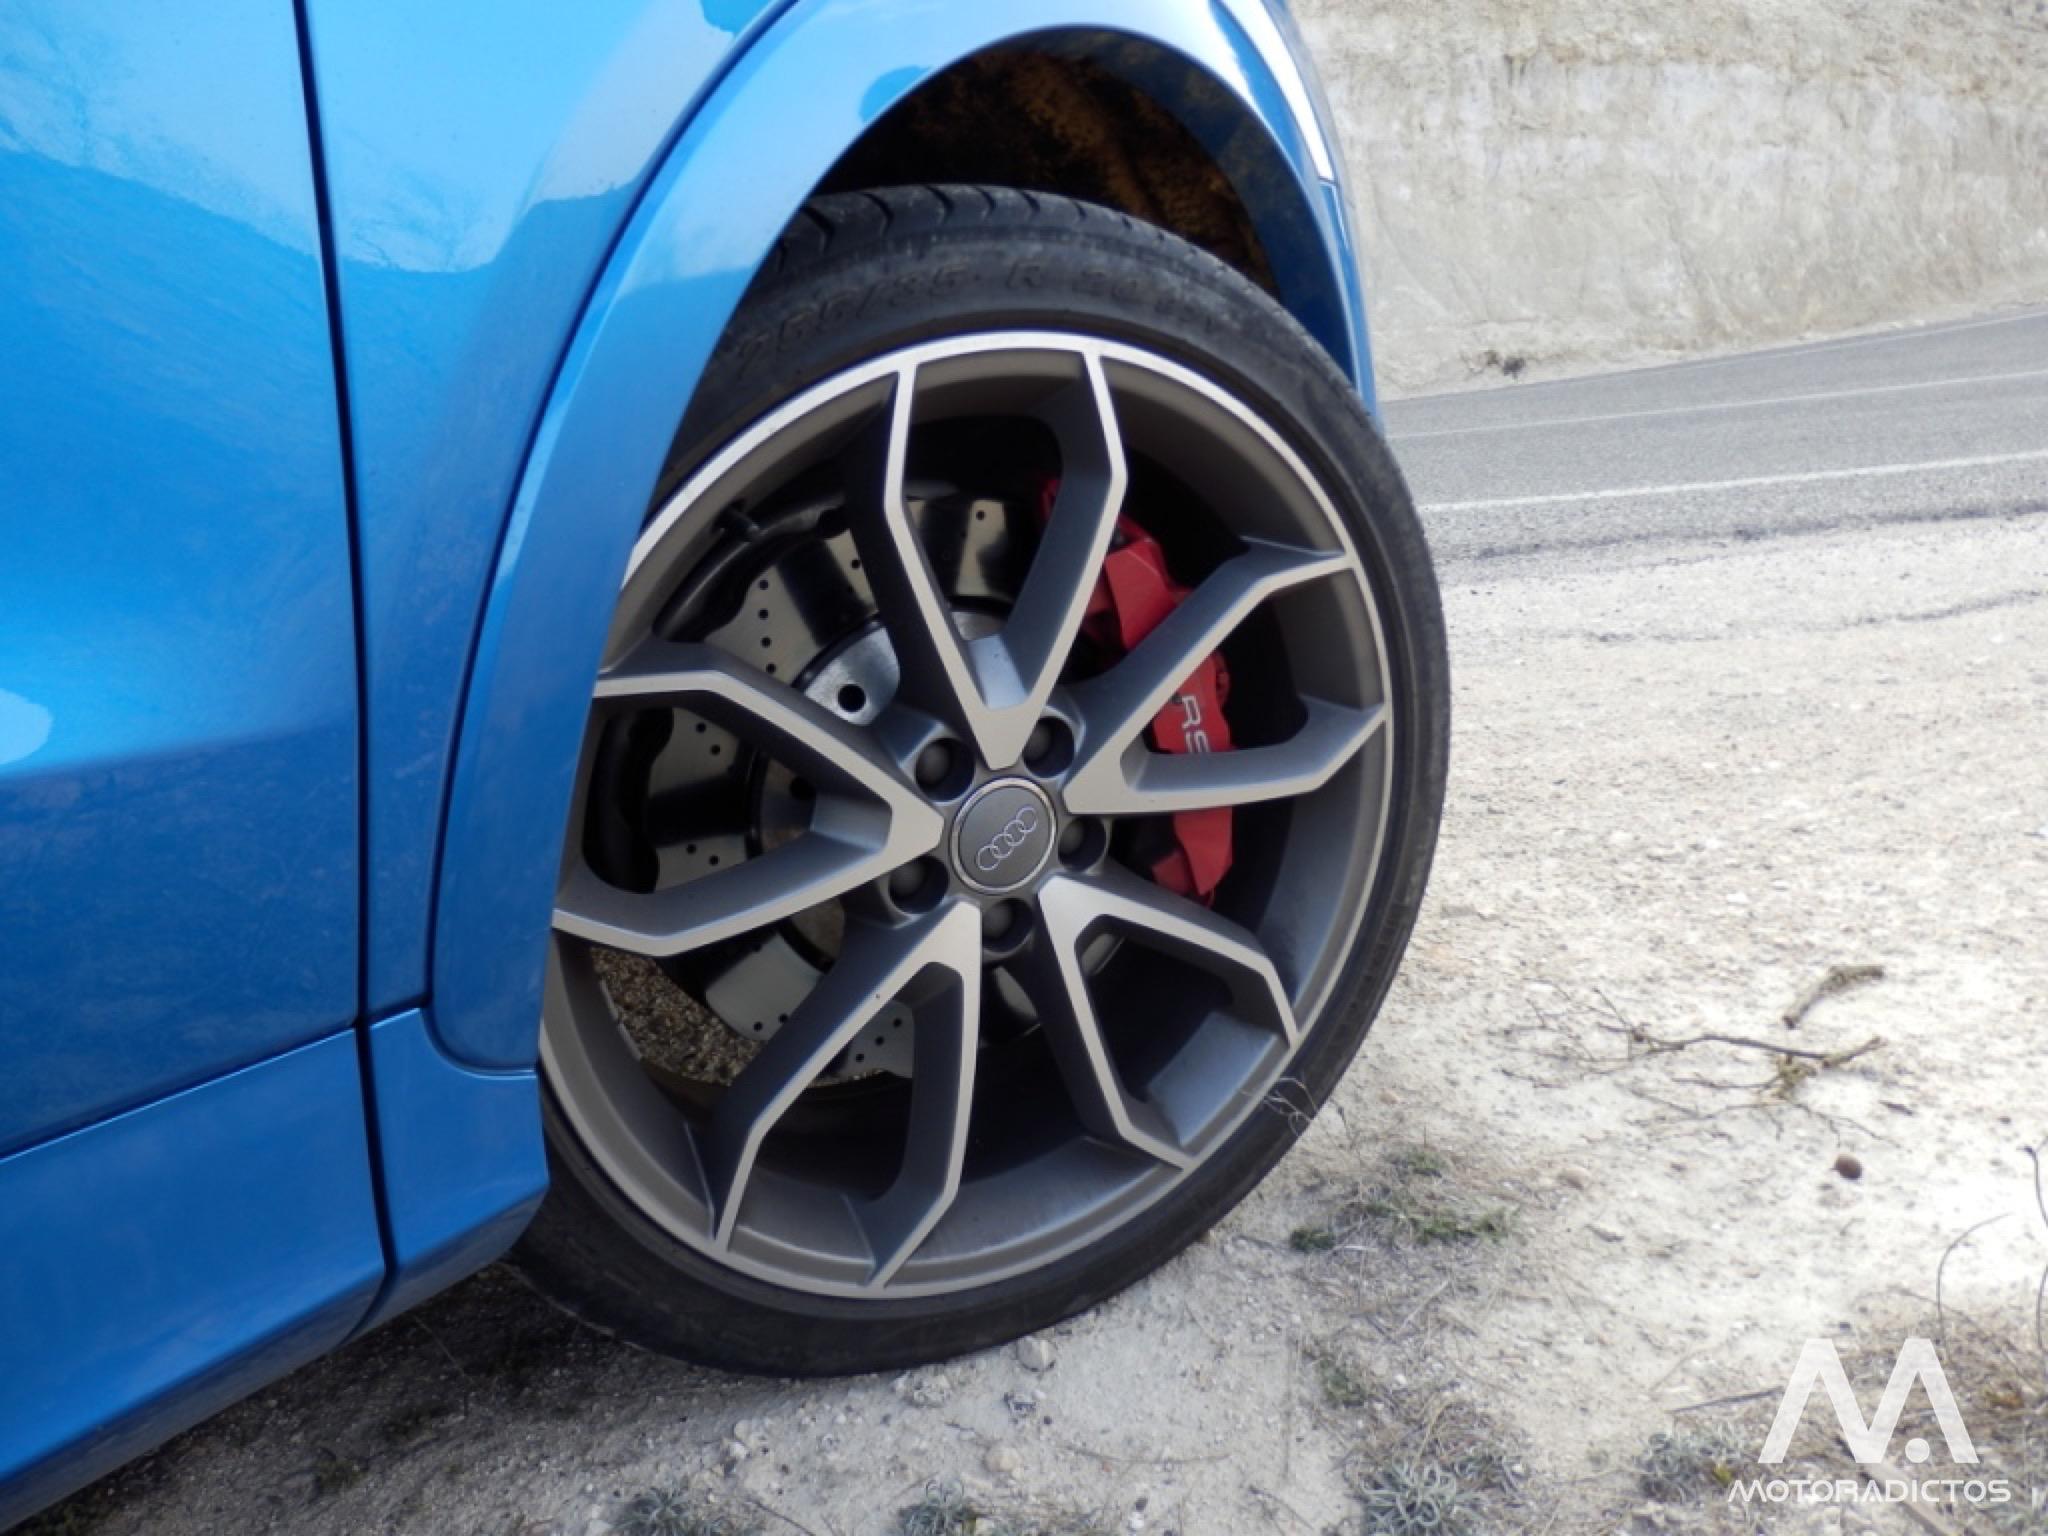 Prueba: Audi RS Q3 2.5 TFSI 340 CV (diseño, habitáculo, mecánica) 12